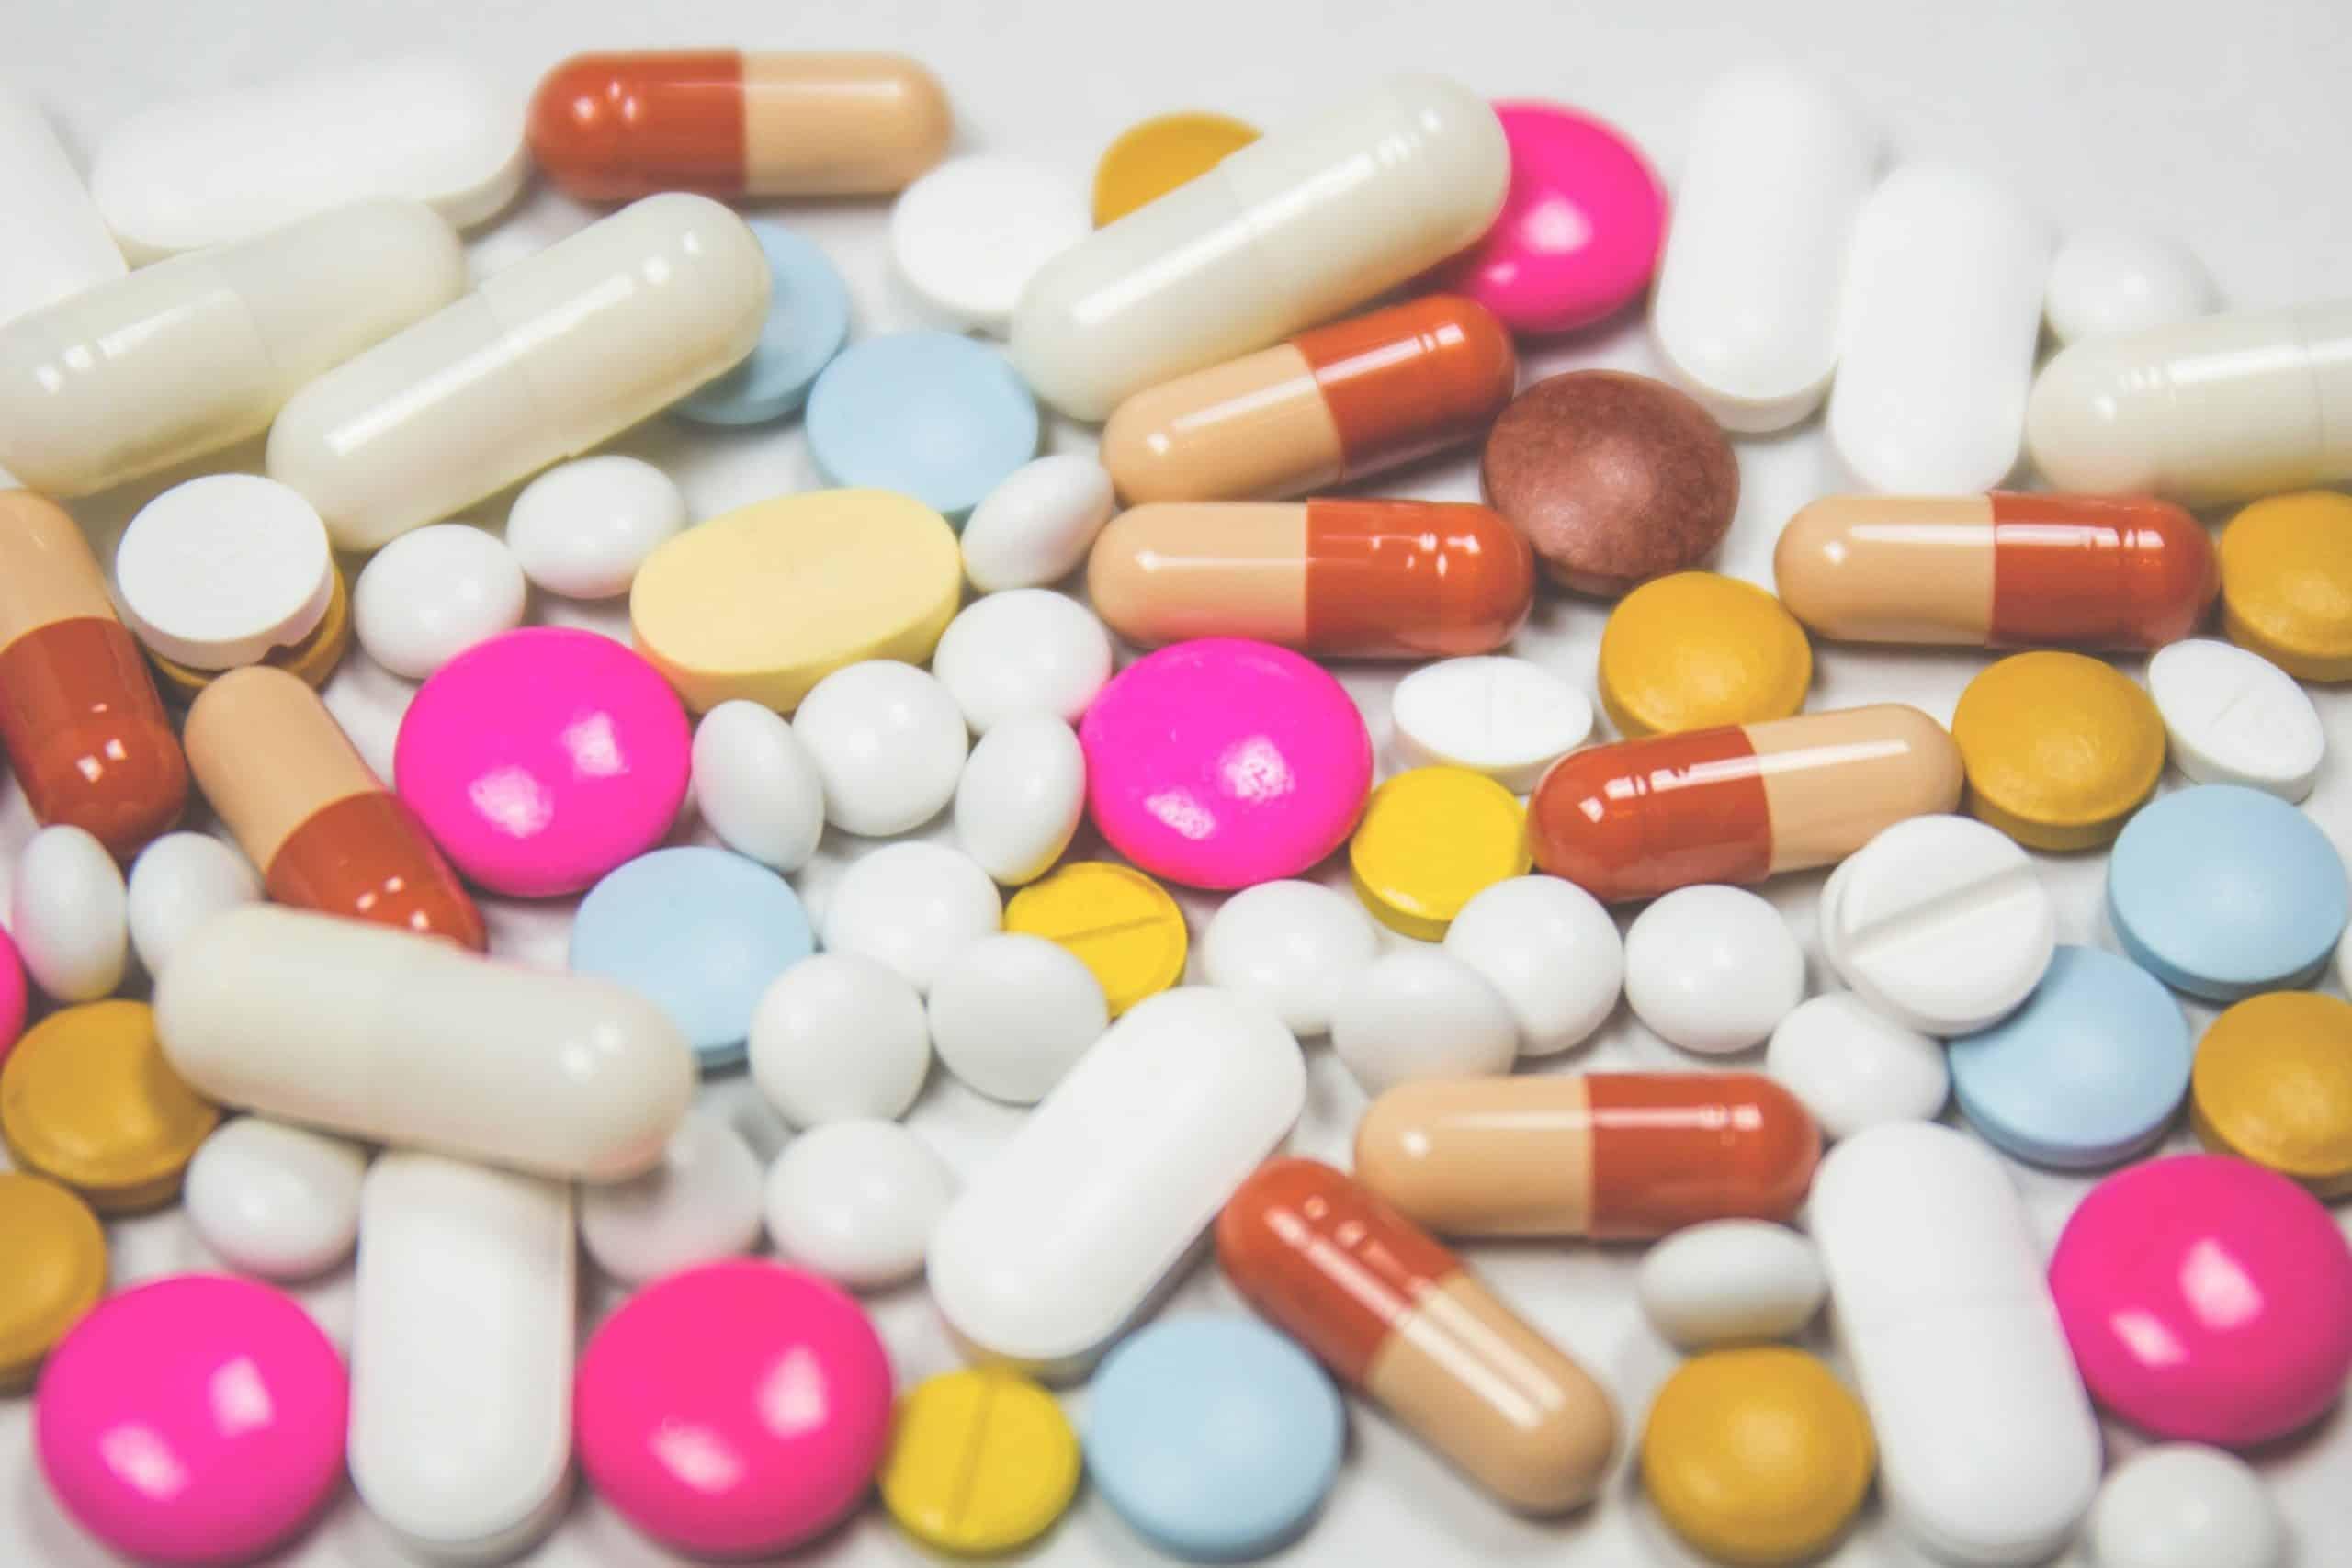 Größter Pharmahändler in Deutschland: PHOENIX Pharmahandel GmbH & Co KG